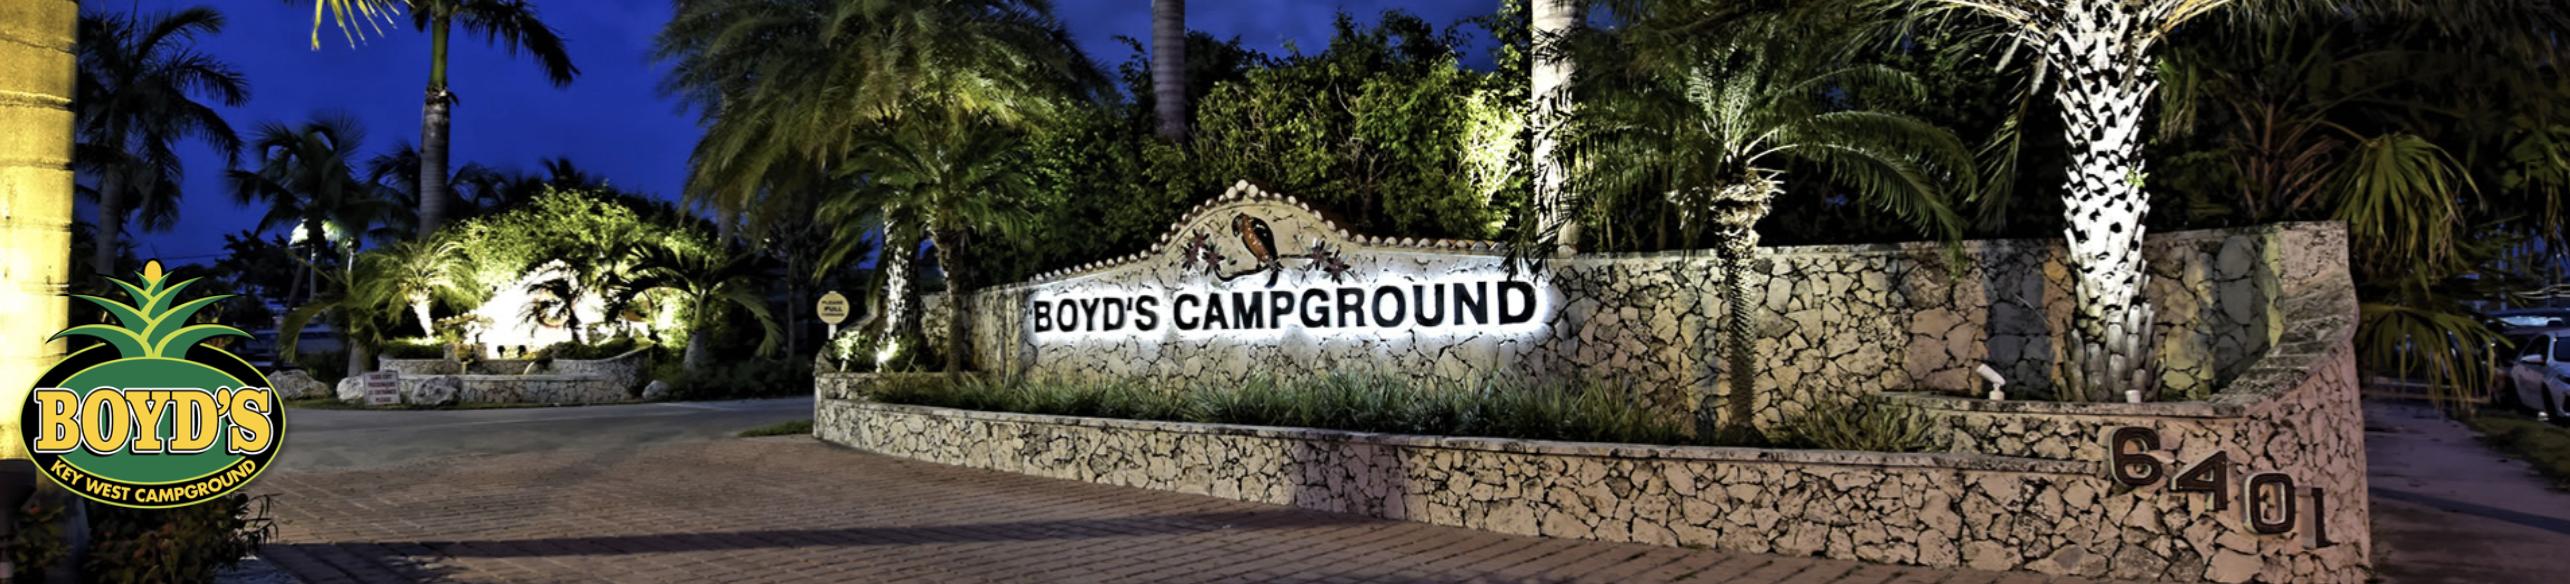 Boyd's Key West Campground